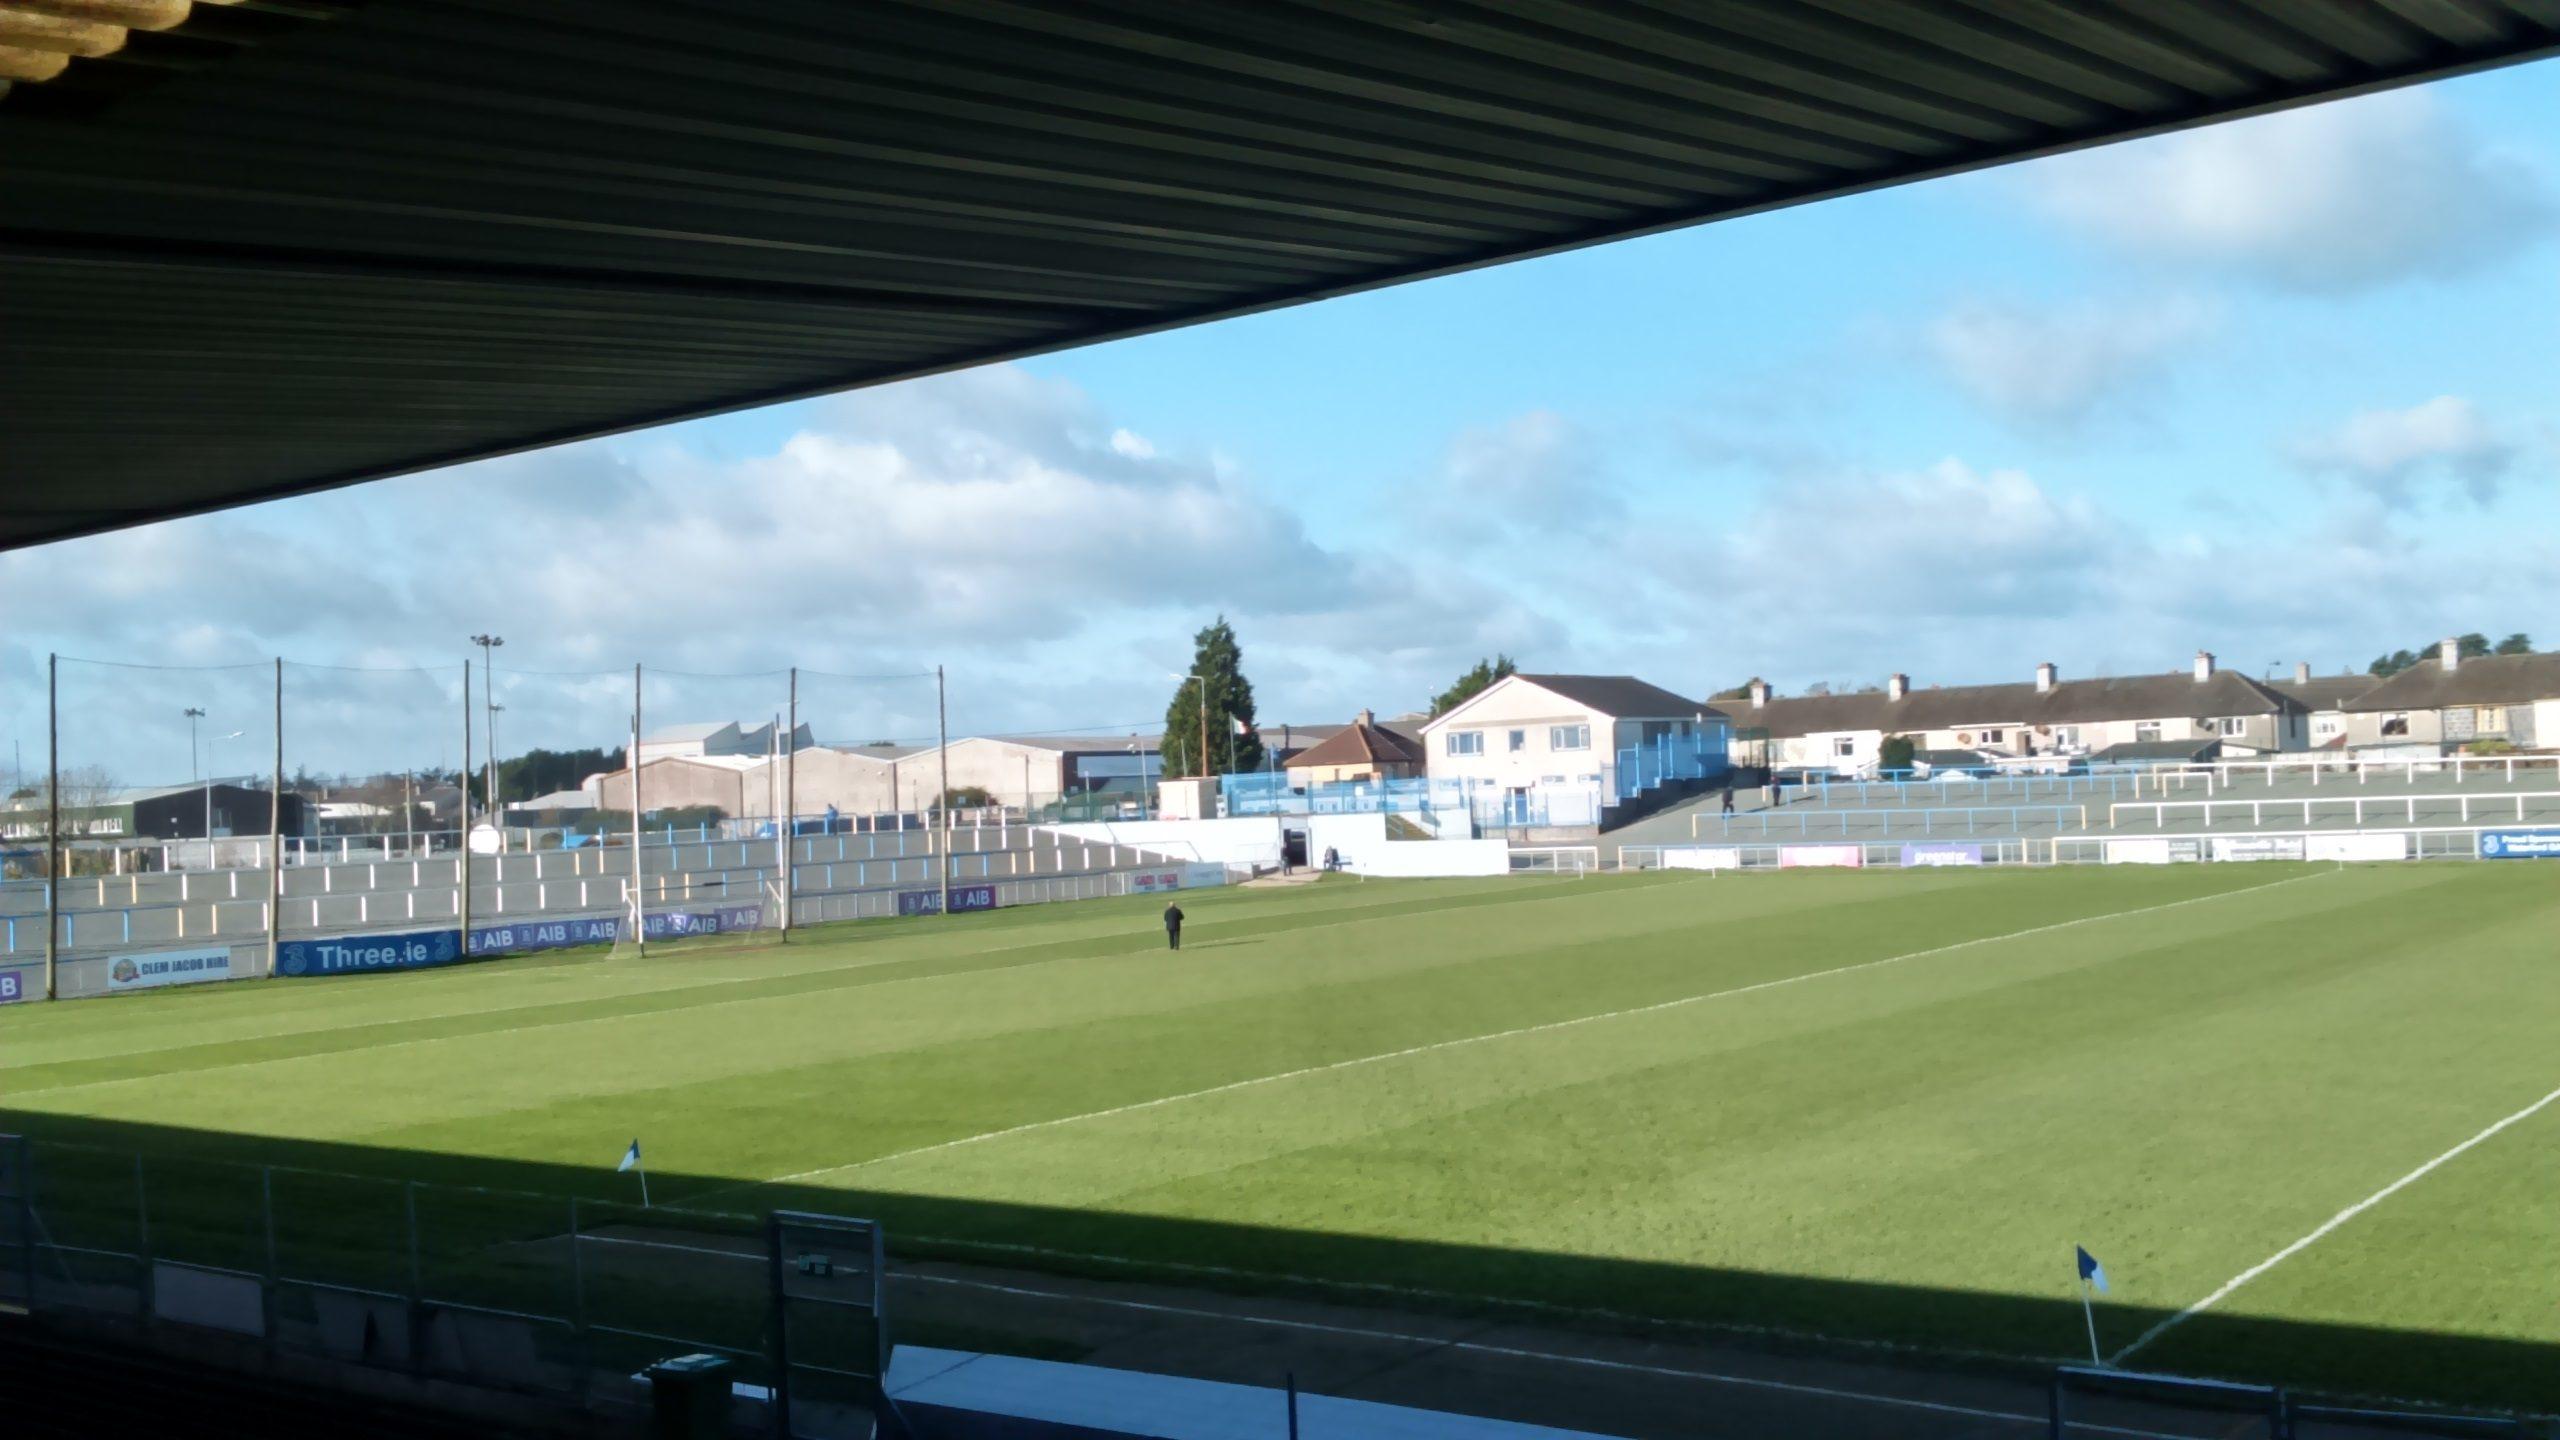 Waterford GAA Co. Board Awards Night takes place tonight in Dungarvan